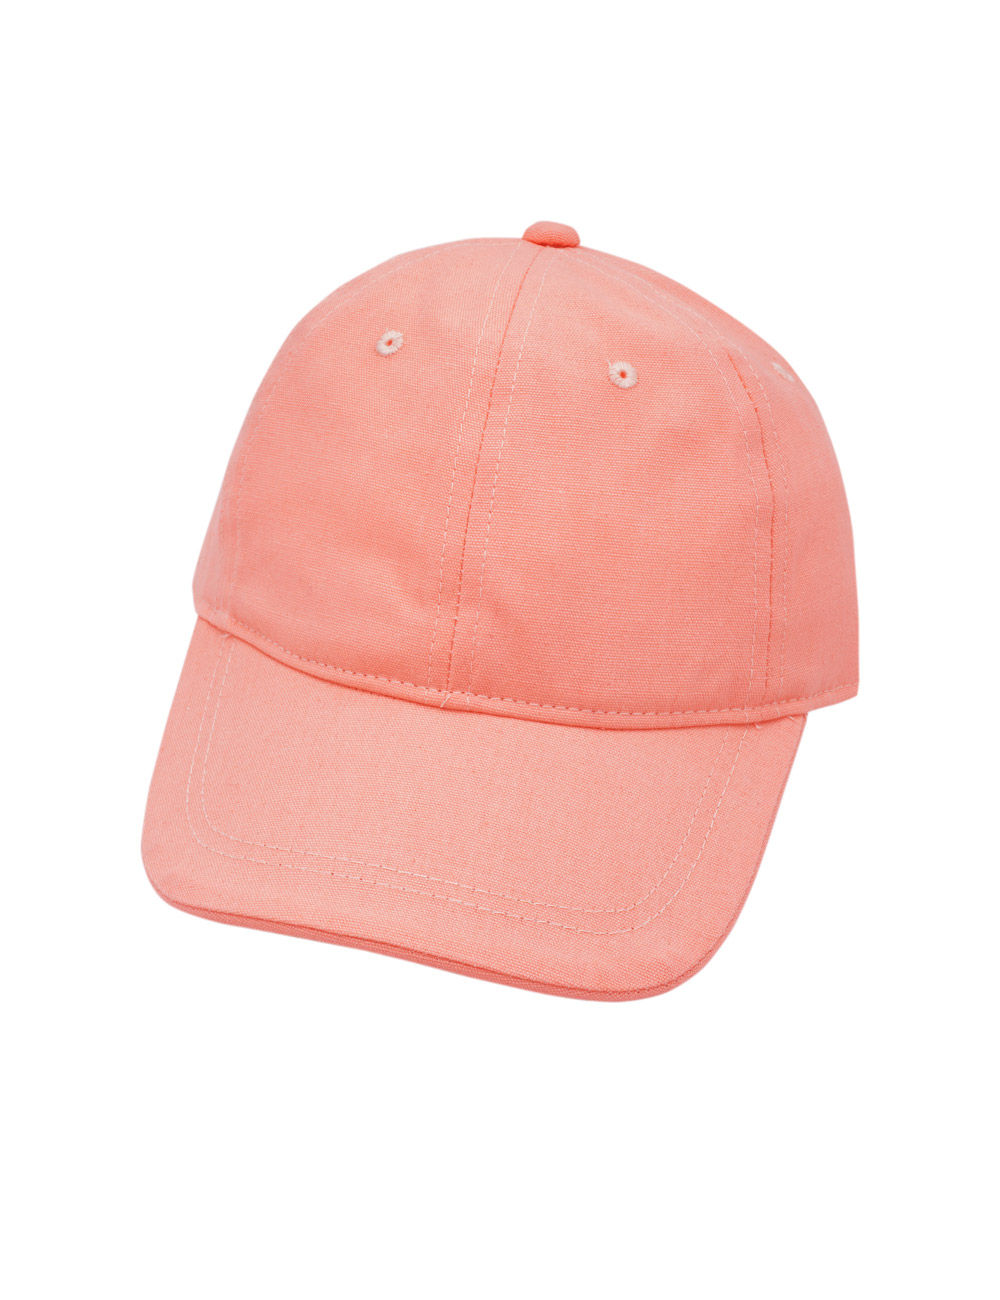 Cap, stark gebogenes Dach 47 Maximo. Farbe: flamingo, Größe: 47/49